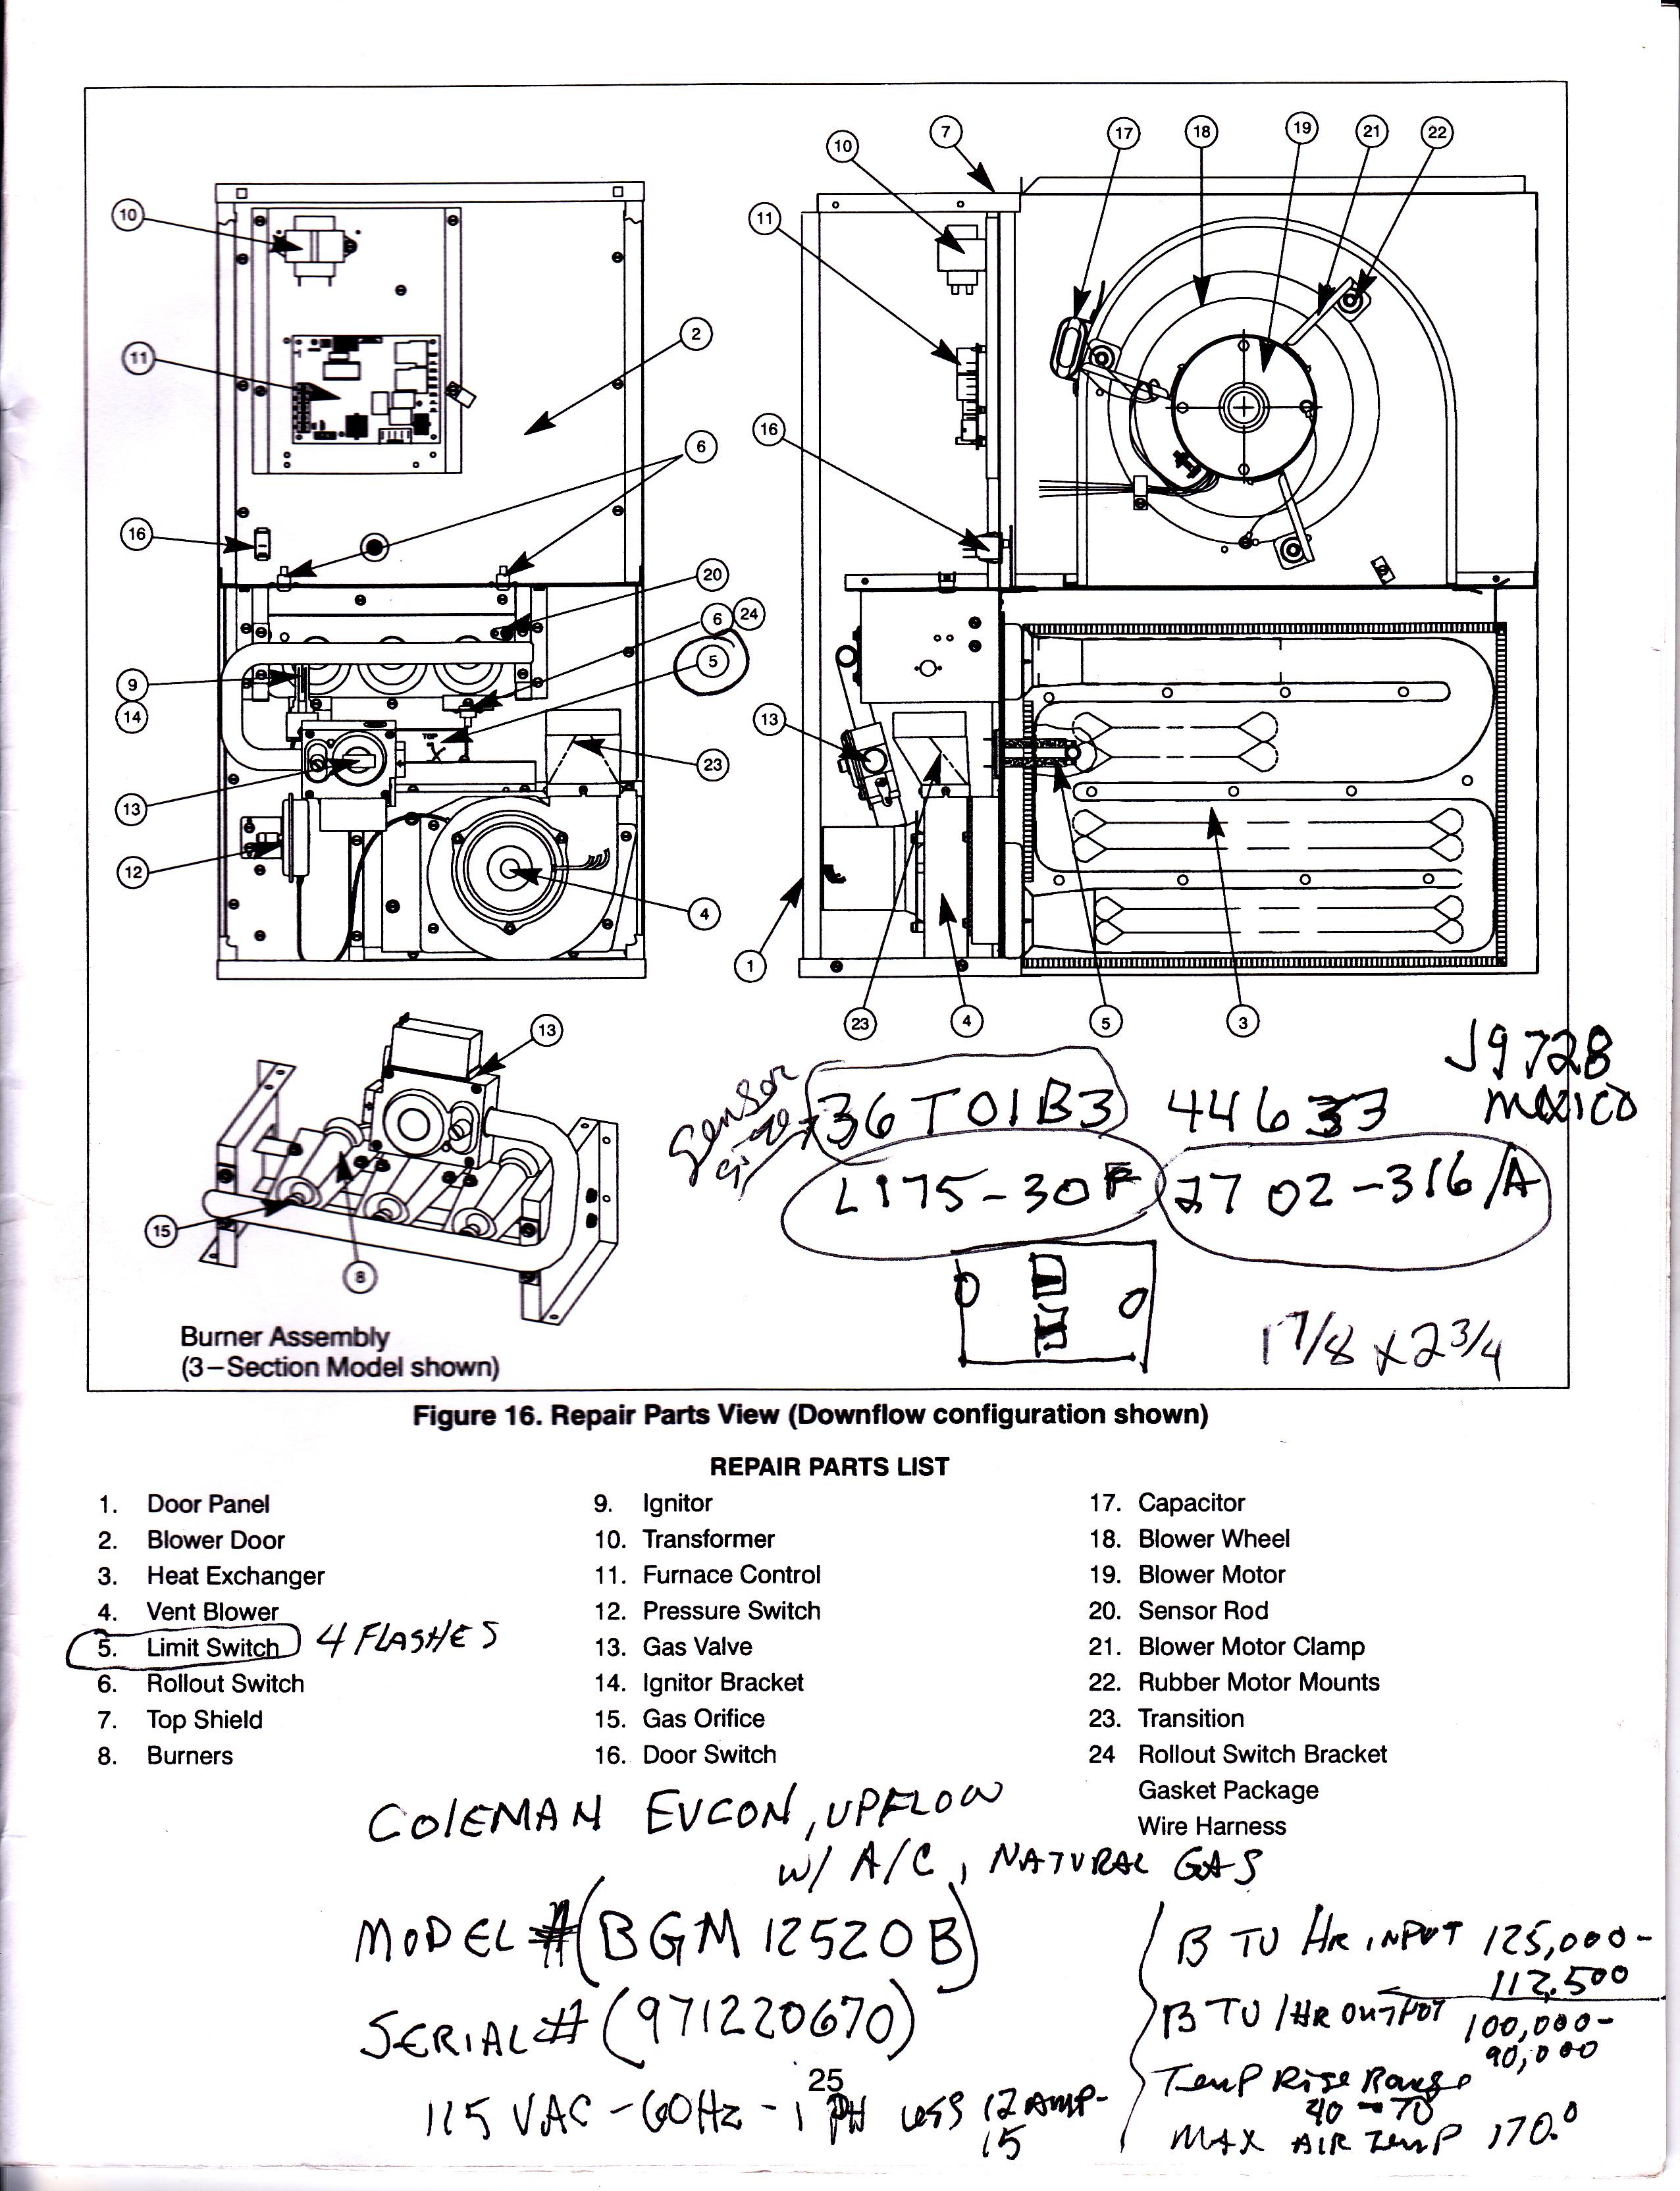 47 Coleman Electric Furnace Wiring Diagram, Coleman Electric Furnace - Coleman Electric Furnace Wiring Diagram